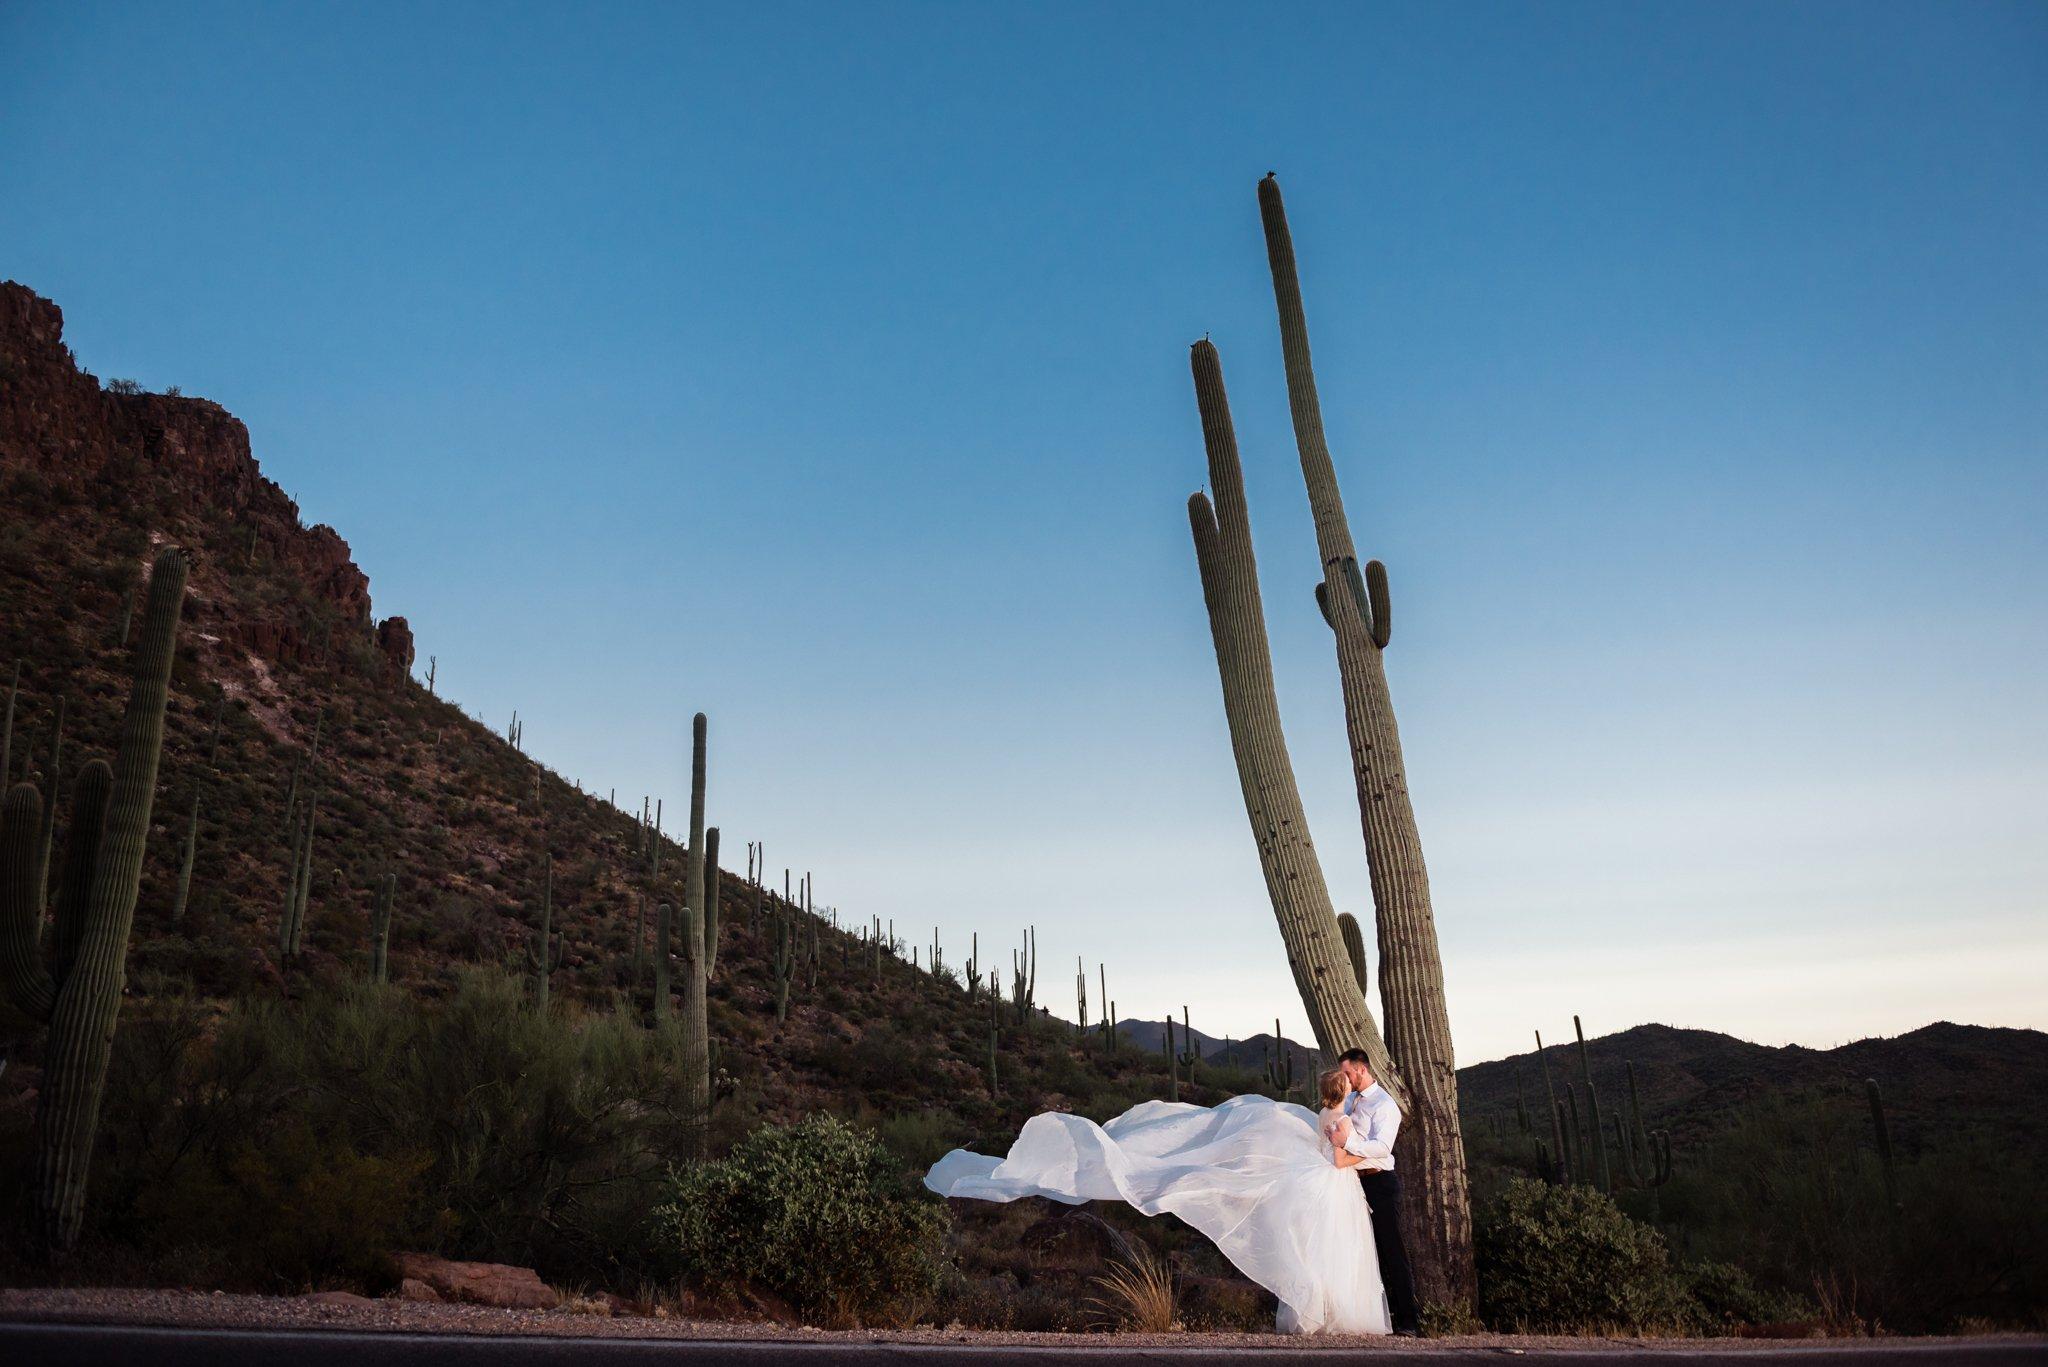 Wedding elopement photography fine art portrait photographer water bear photography Tucson Arizona USA